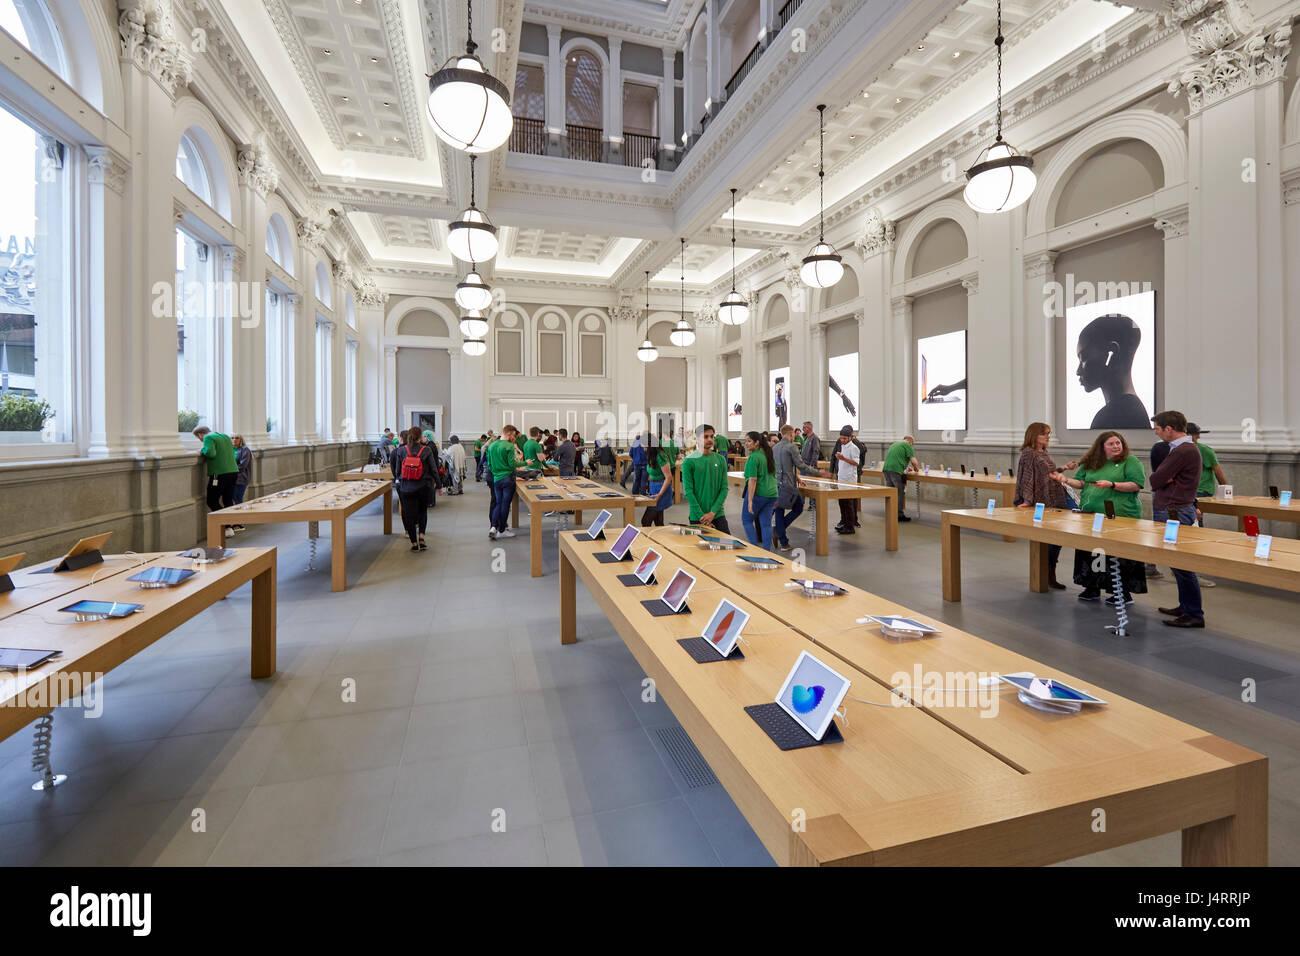 Interior of the Apple Store Birmingham West Midlands England UK